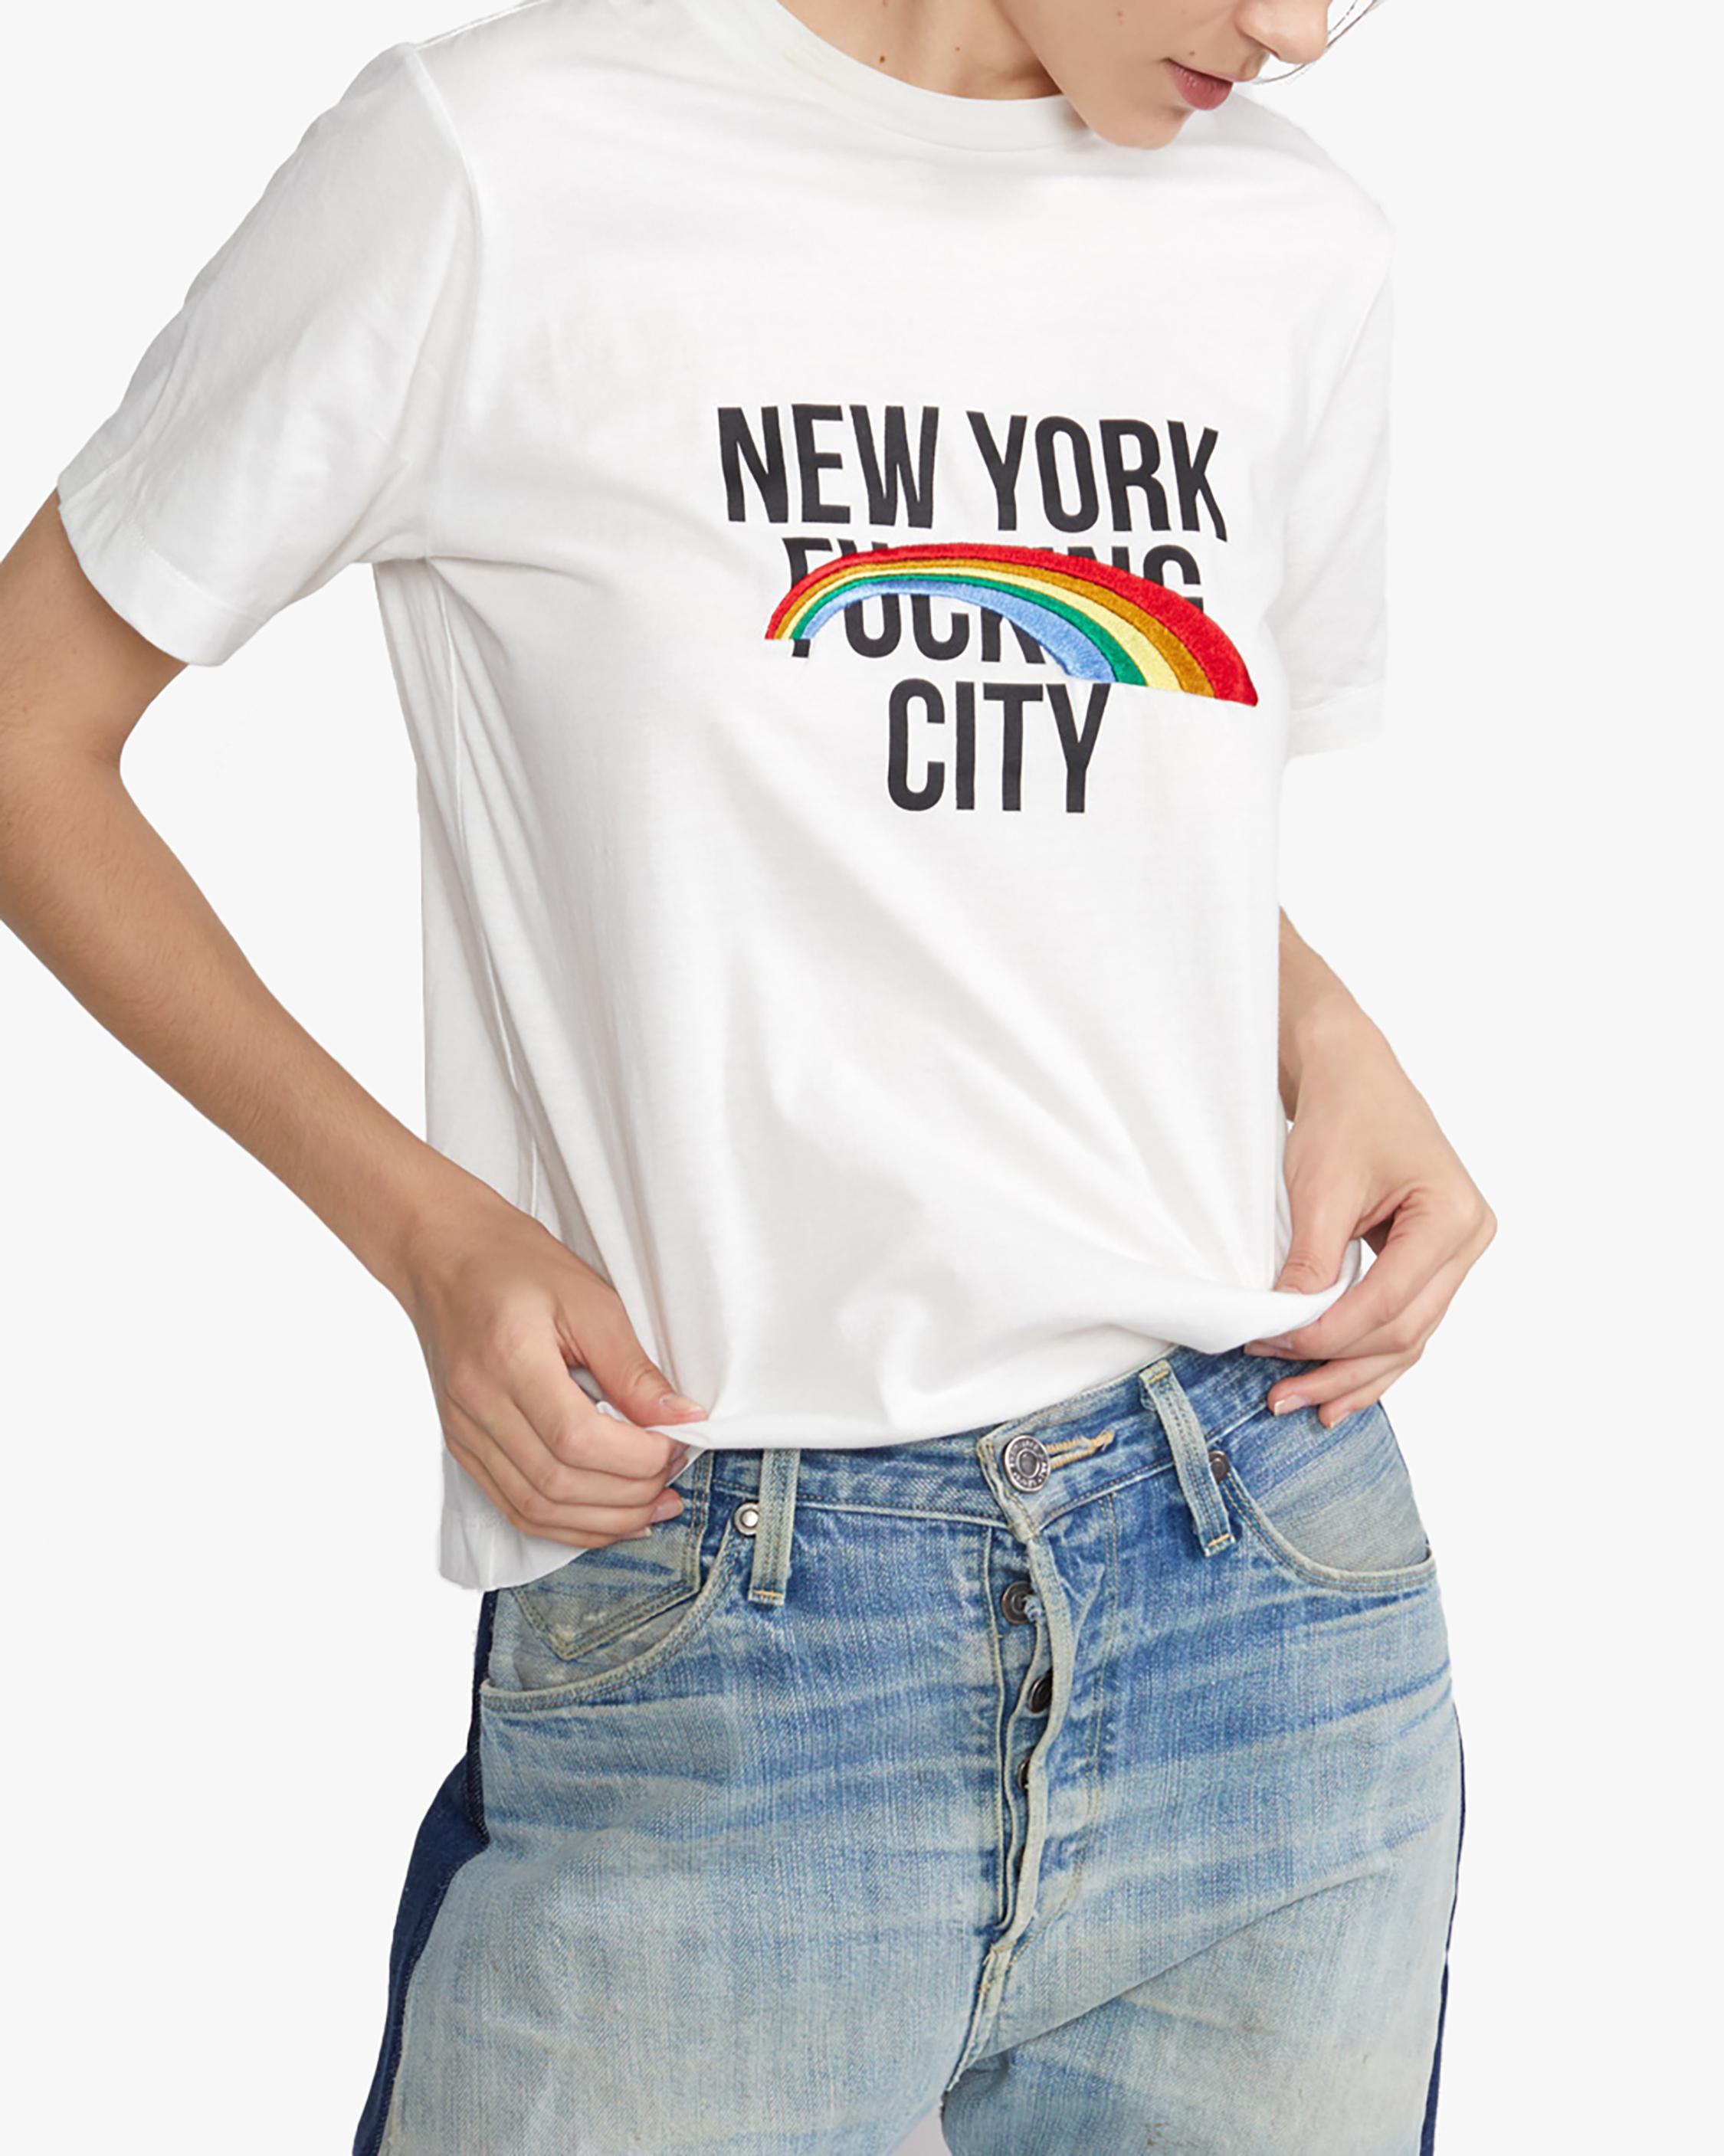 Cynthia Rowley New York Rainbow City Tee 0